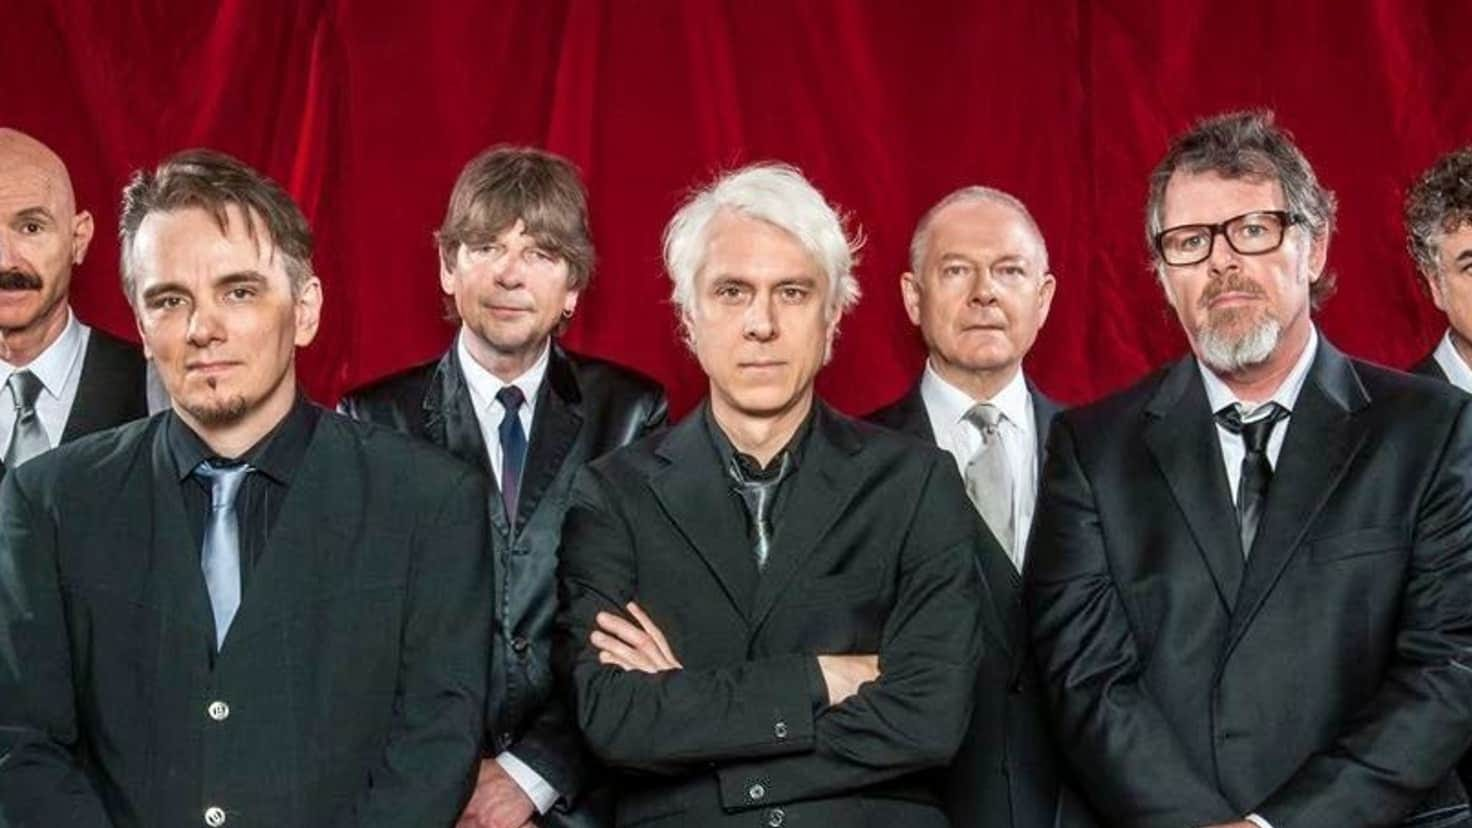 King Crimson tour to visit Graceland in Memphis